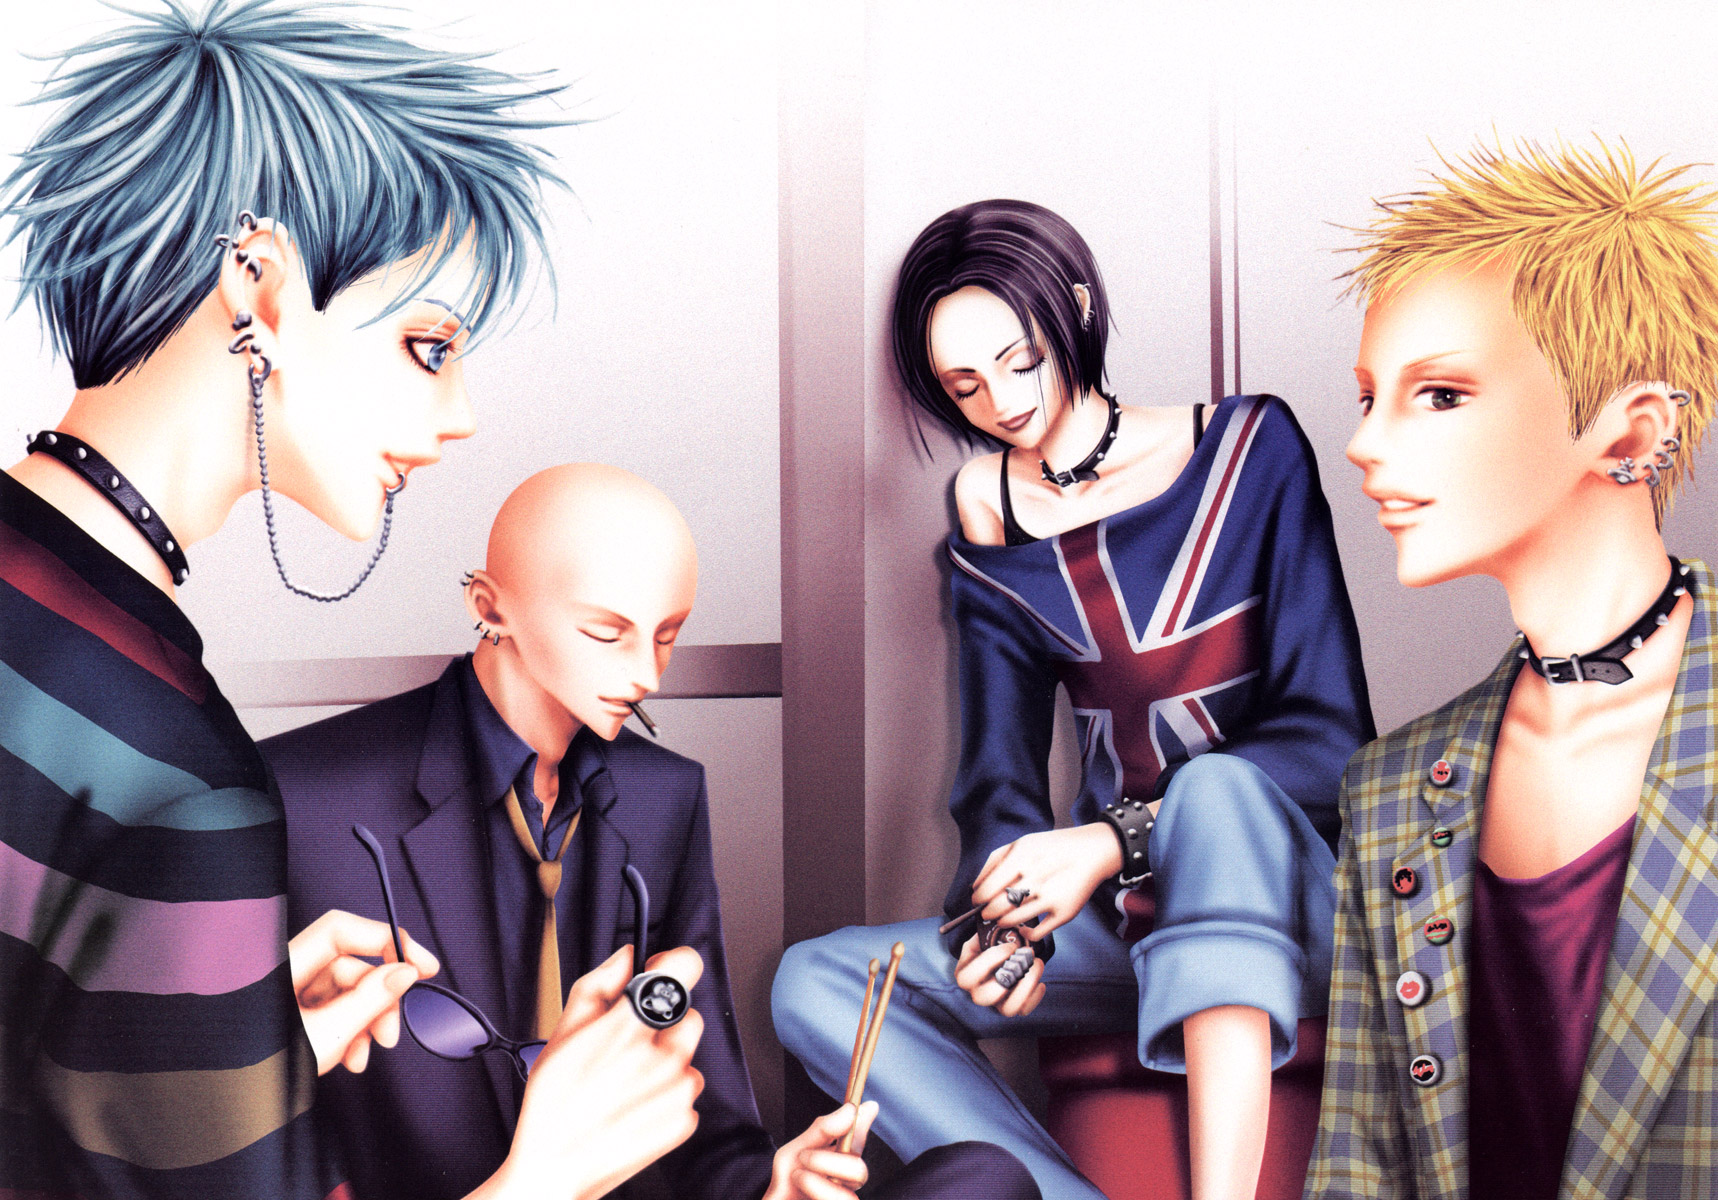 Image Result For Nana Anime Wallpaper Iphone